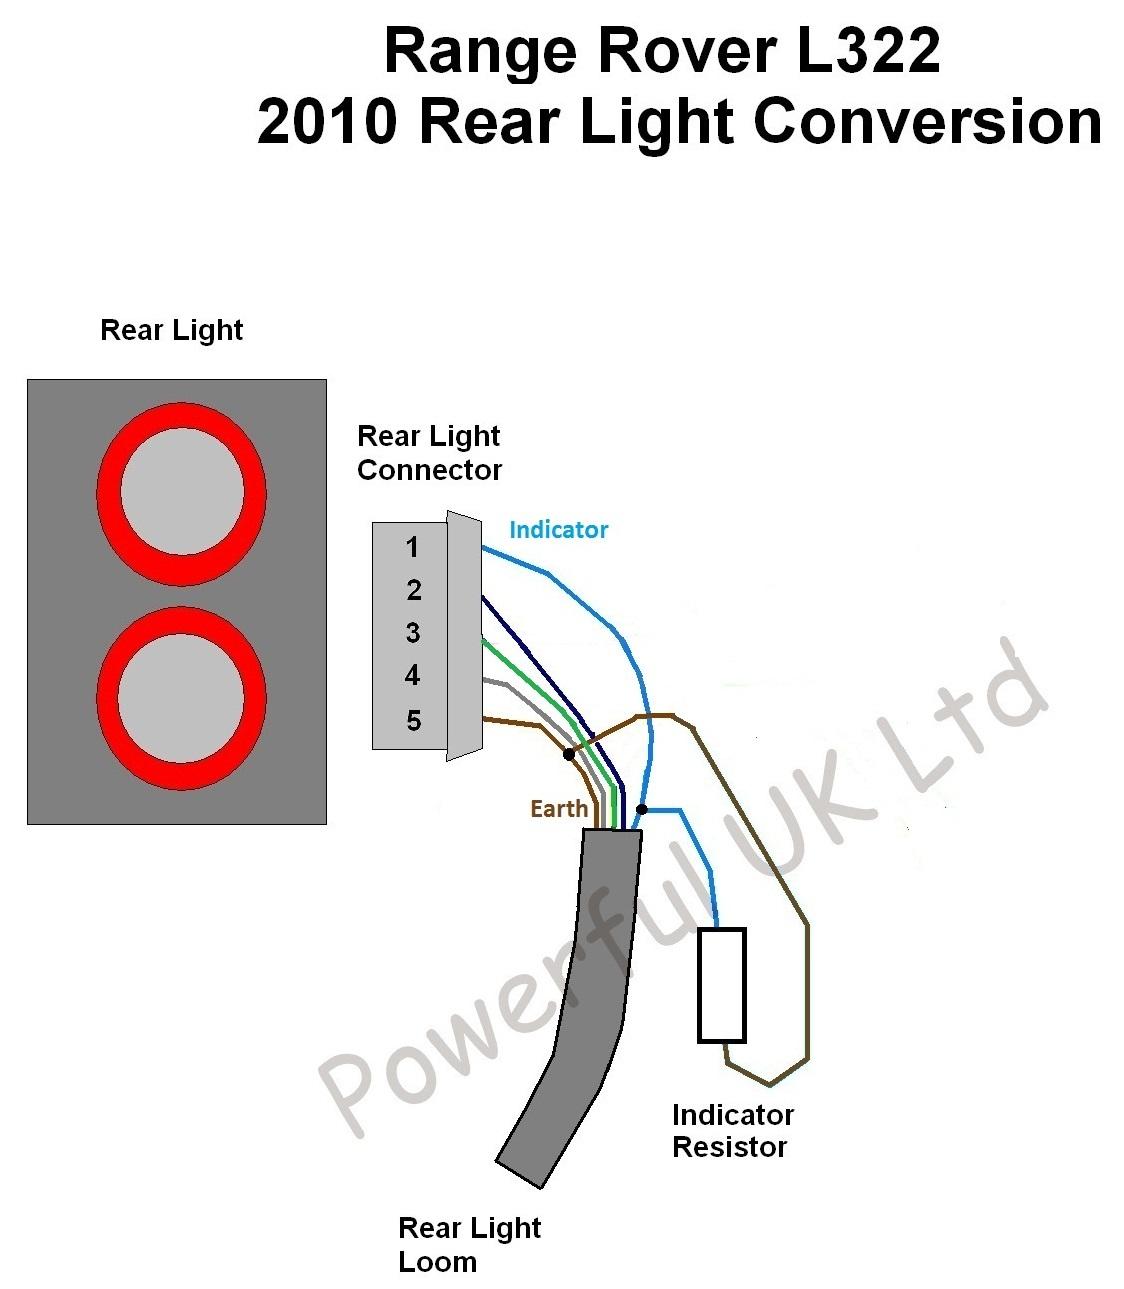 Radio Wiring Harness Diagram For L322 Rover Led Rear Light Ballast Resistors X2 Range 2010 Rh Ebay Co Uk Chevy Factory